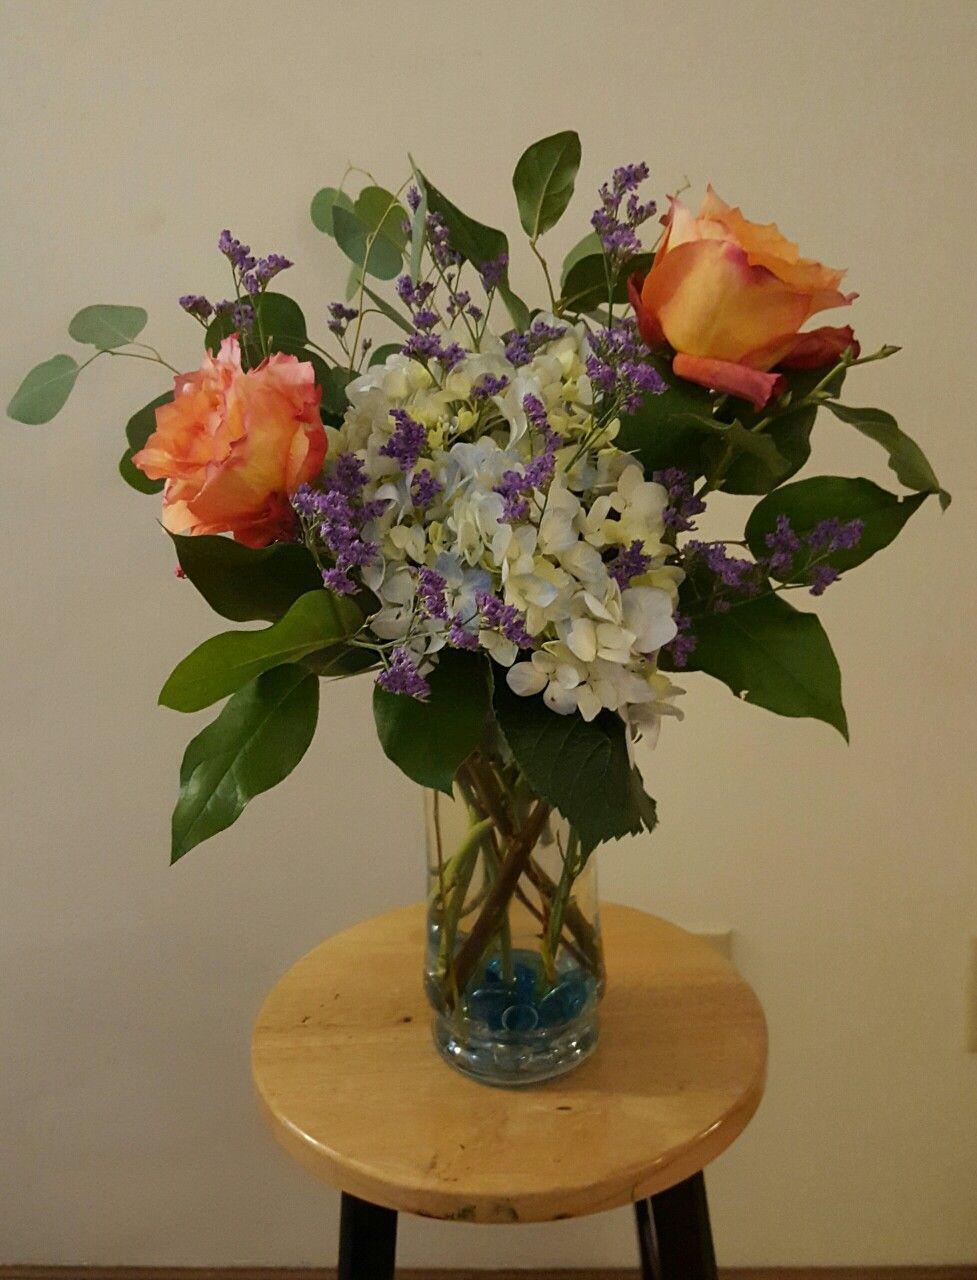 Flower Arrangement With Free Spirit Roses Hydrangea Limonium